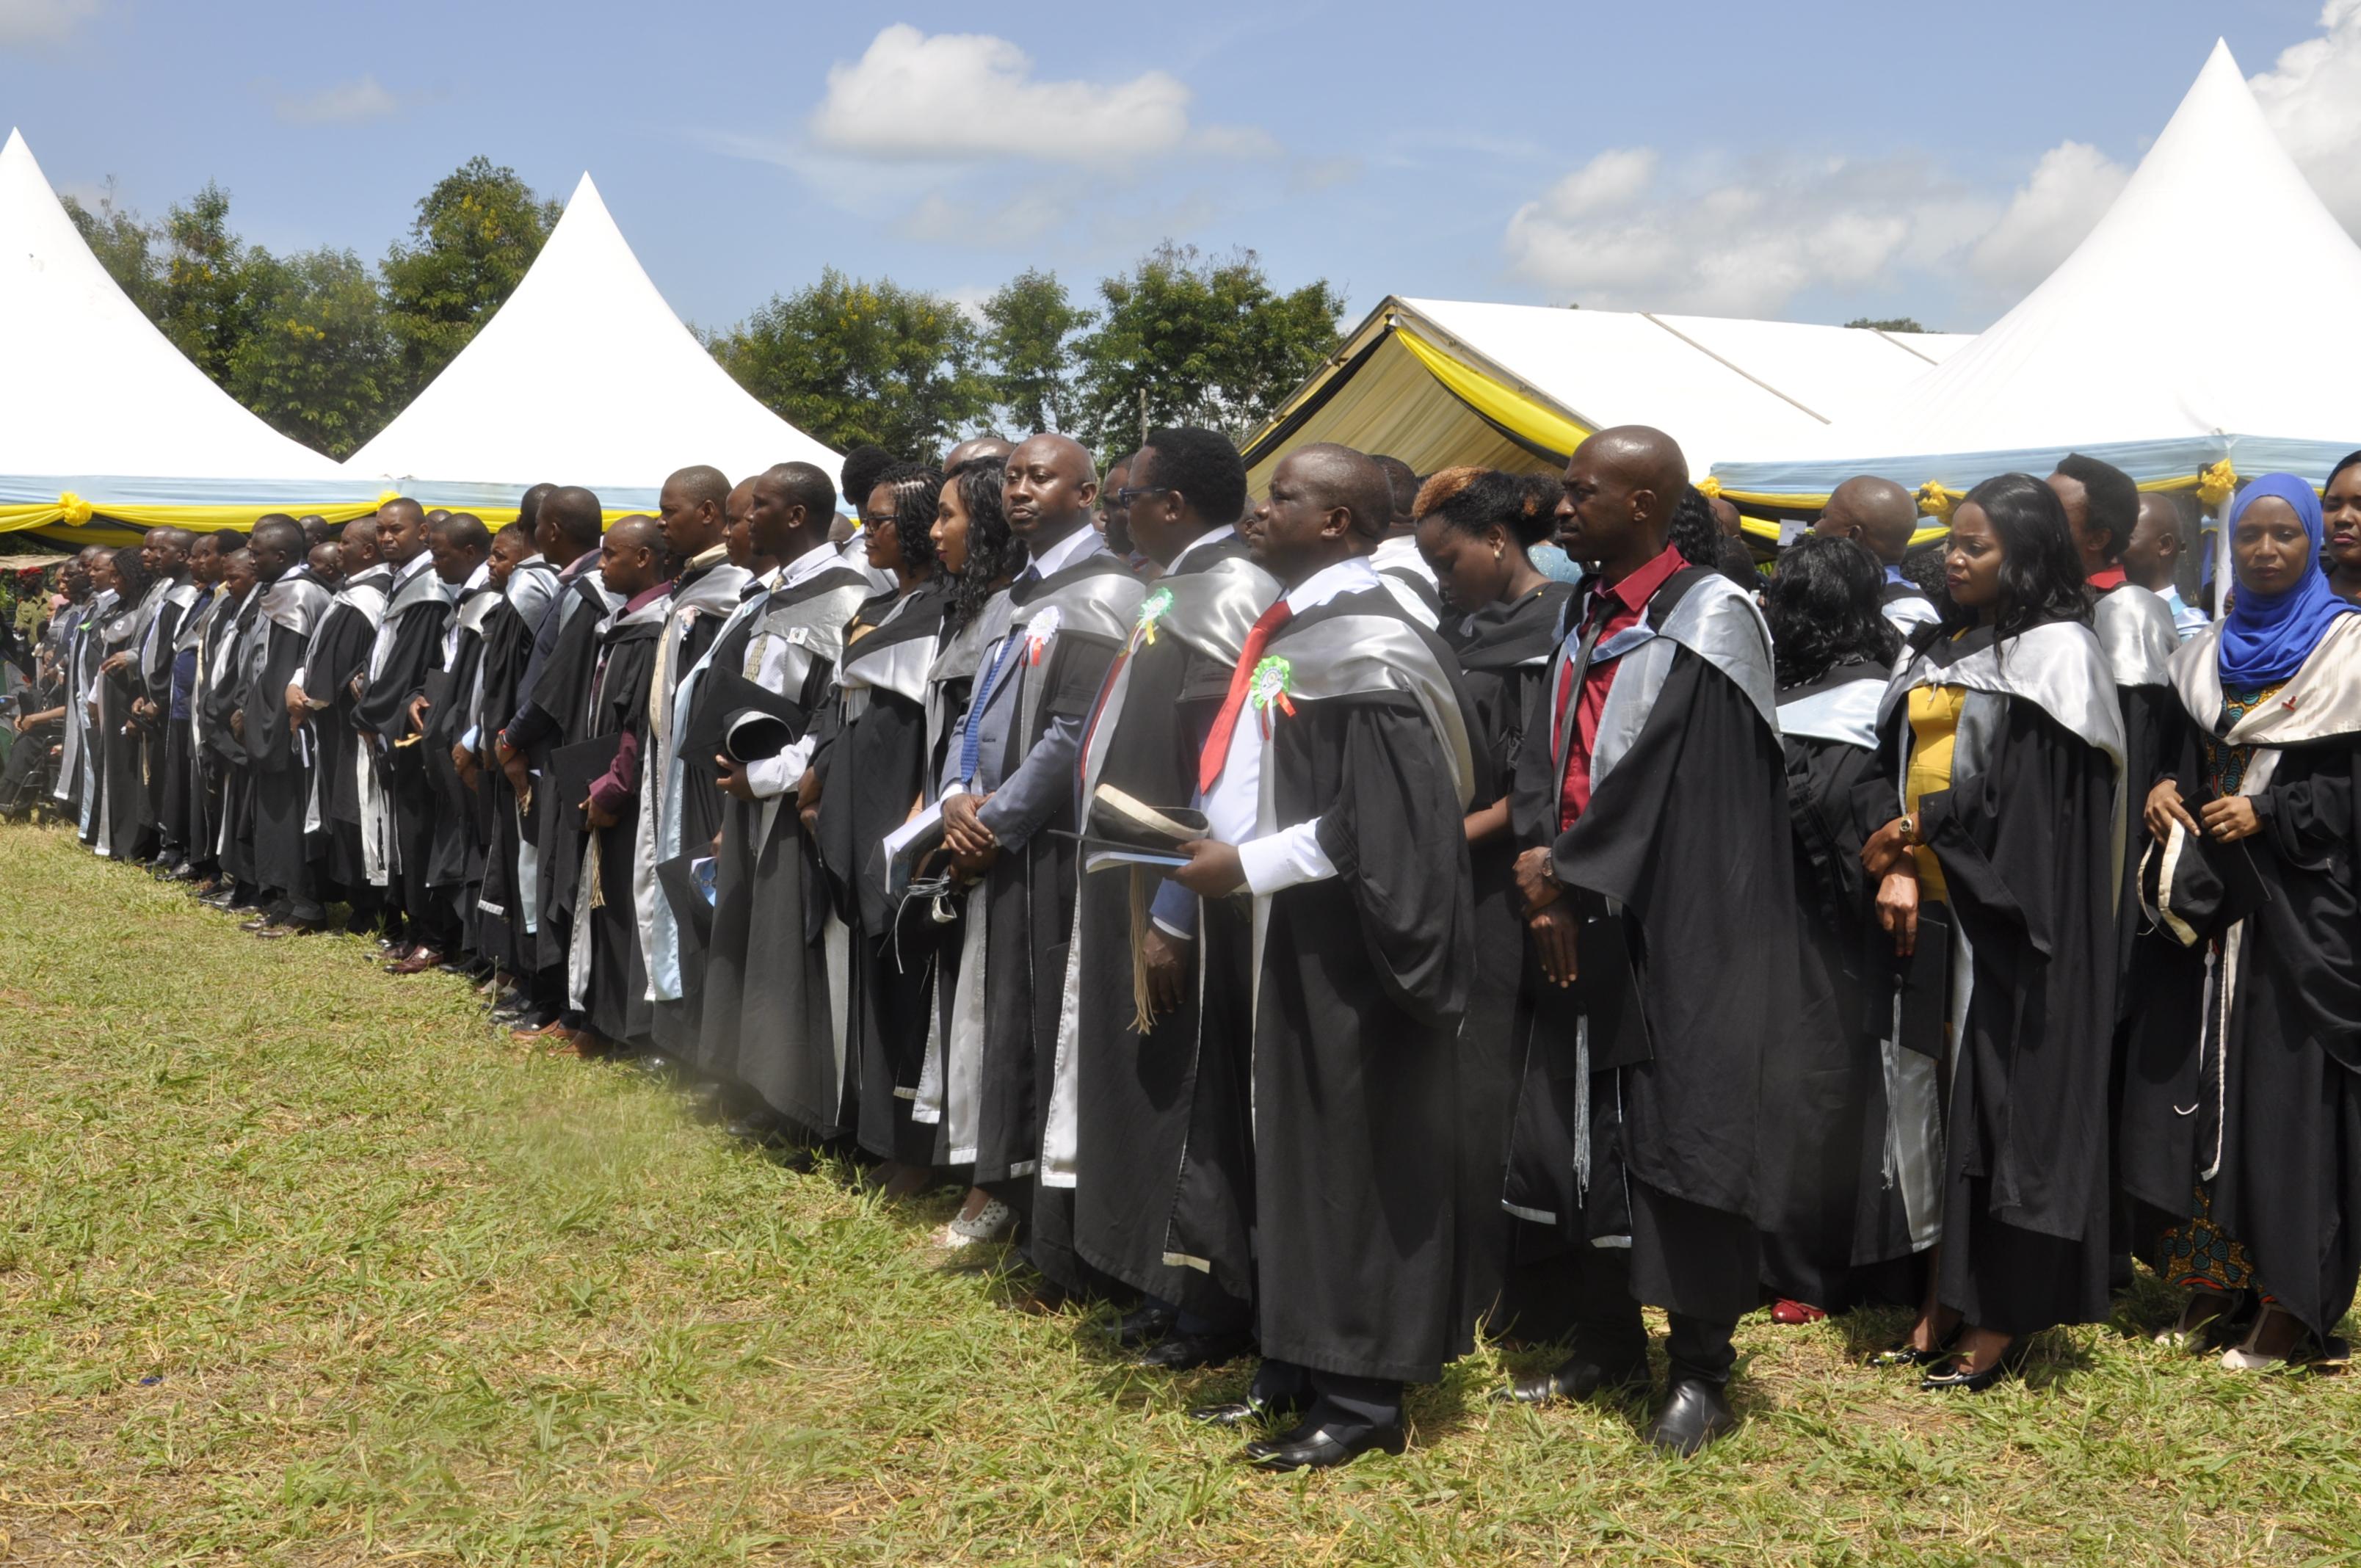 Undergraduate studentsduring the 37th graduation ceremony of the Open University of Tanzania held on 28th September 2019 at Bungo, Kibaha